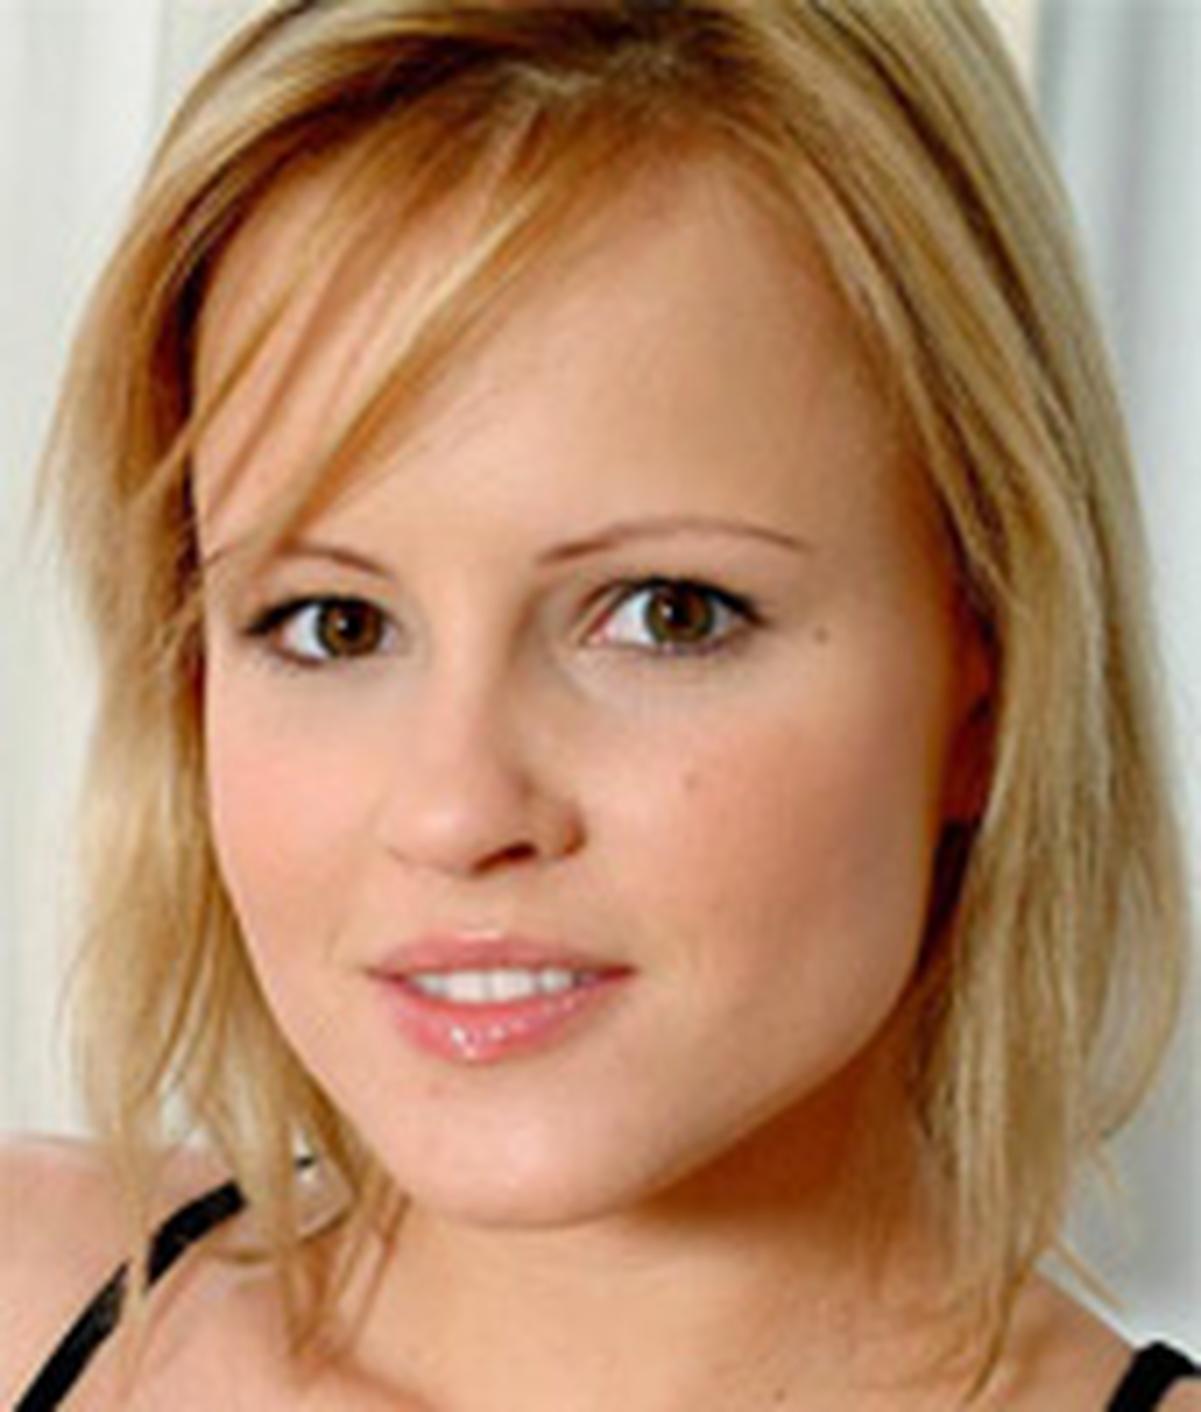 Monica Sweet | Wiki & Bio | Everipedia